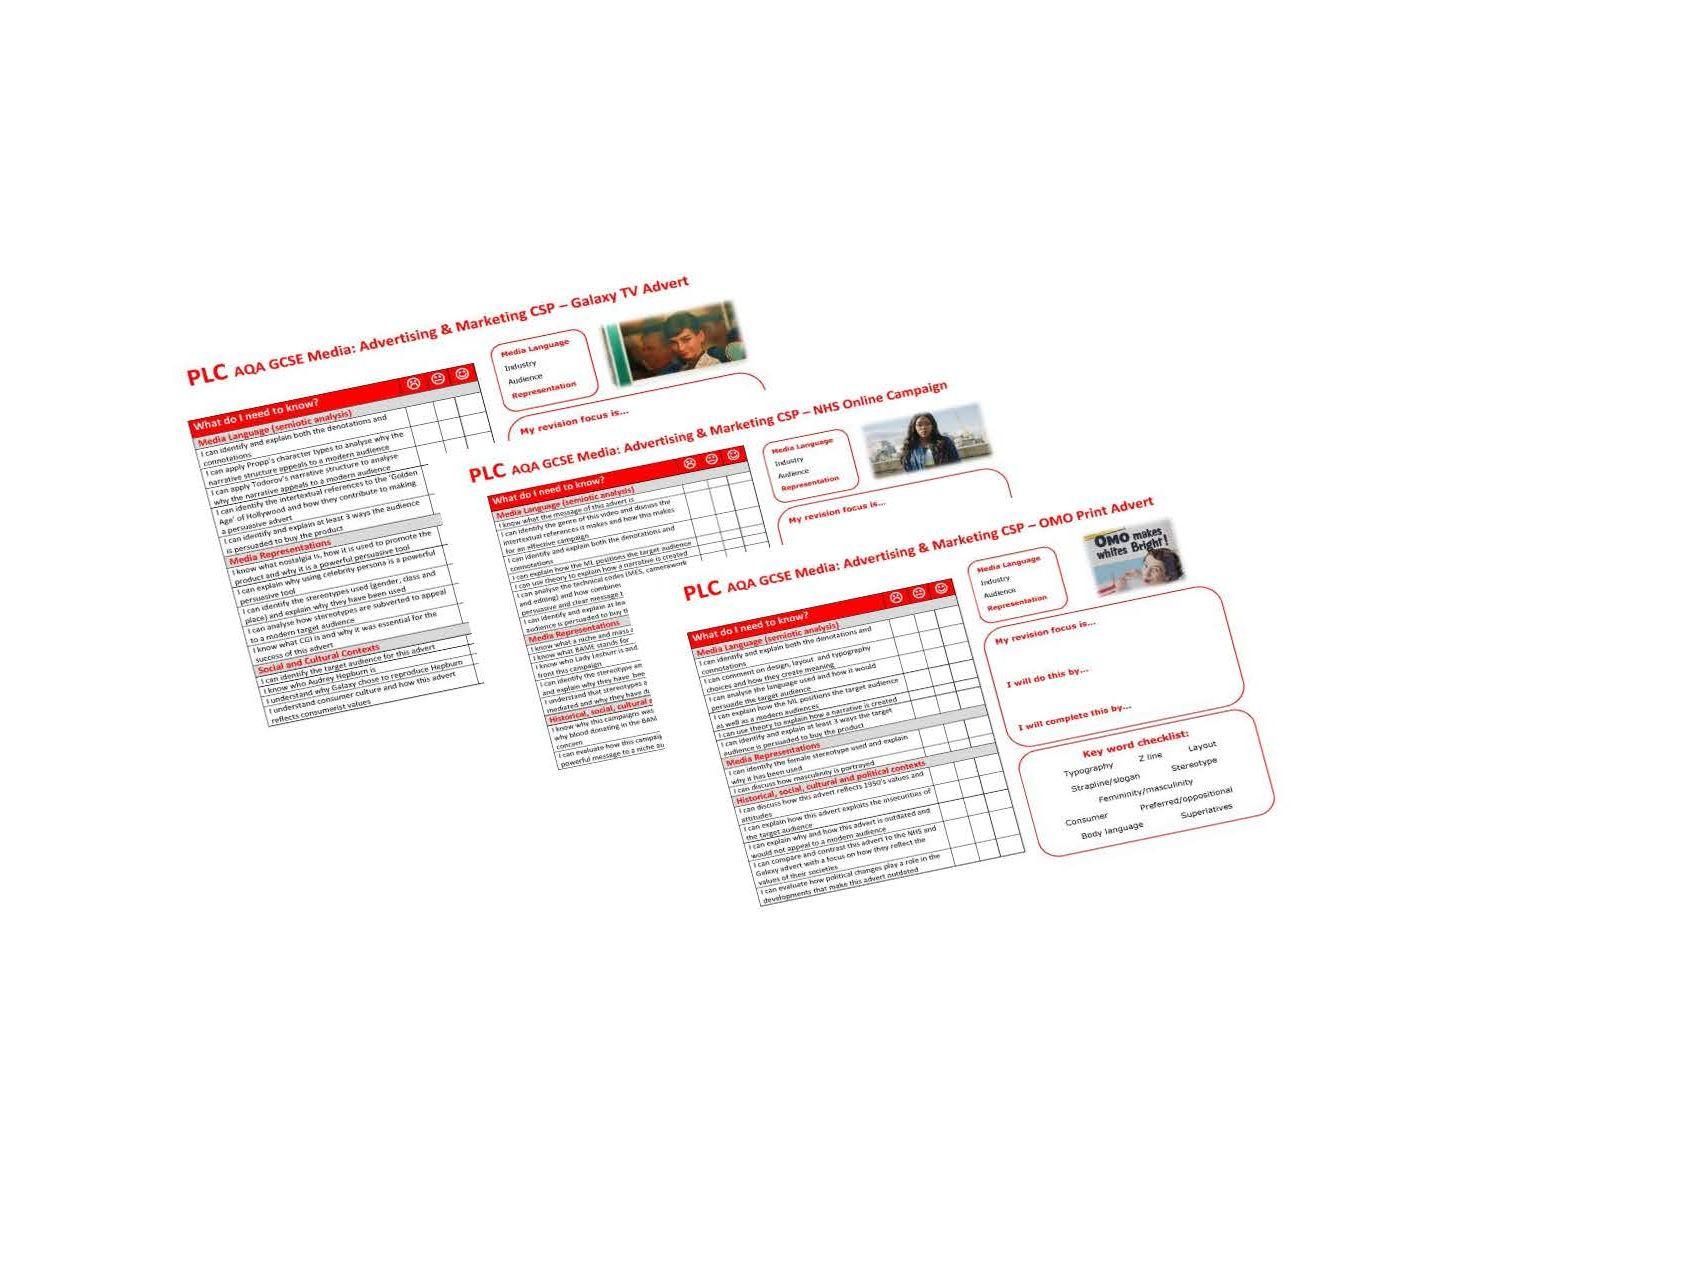 AQA GCSE Media Adv & Marketing PLCs